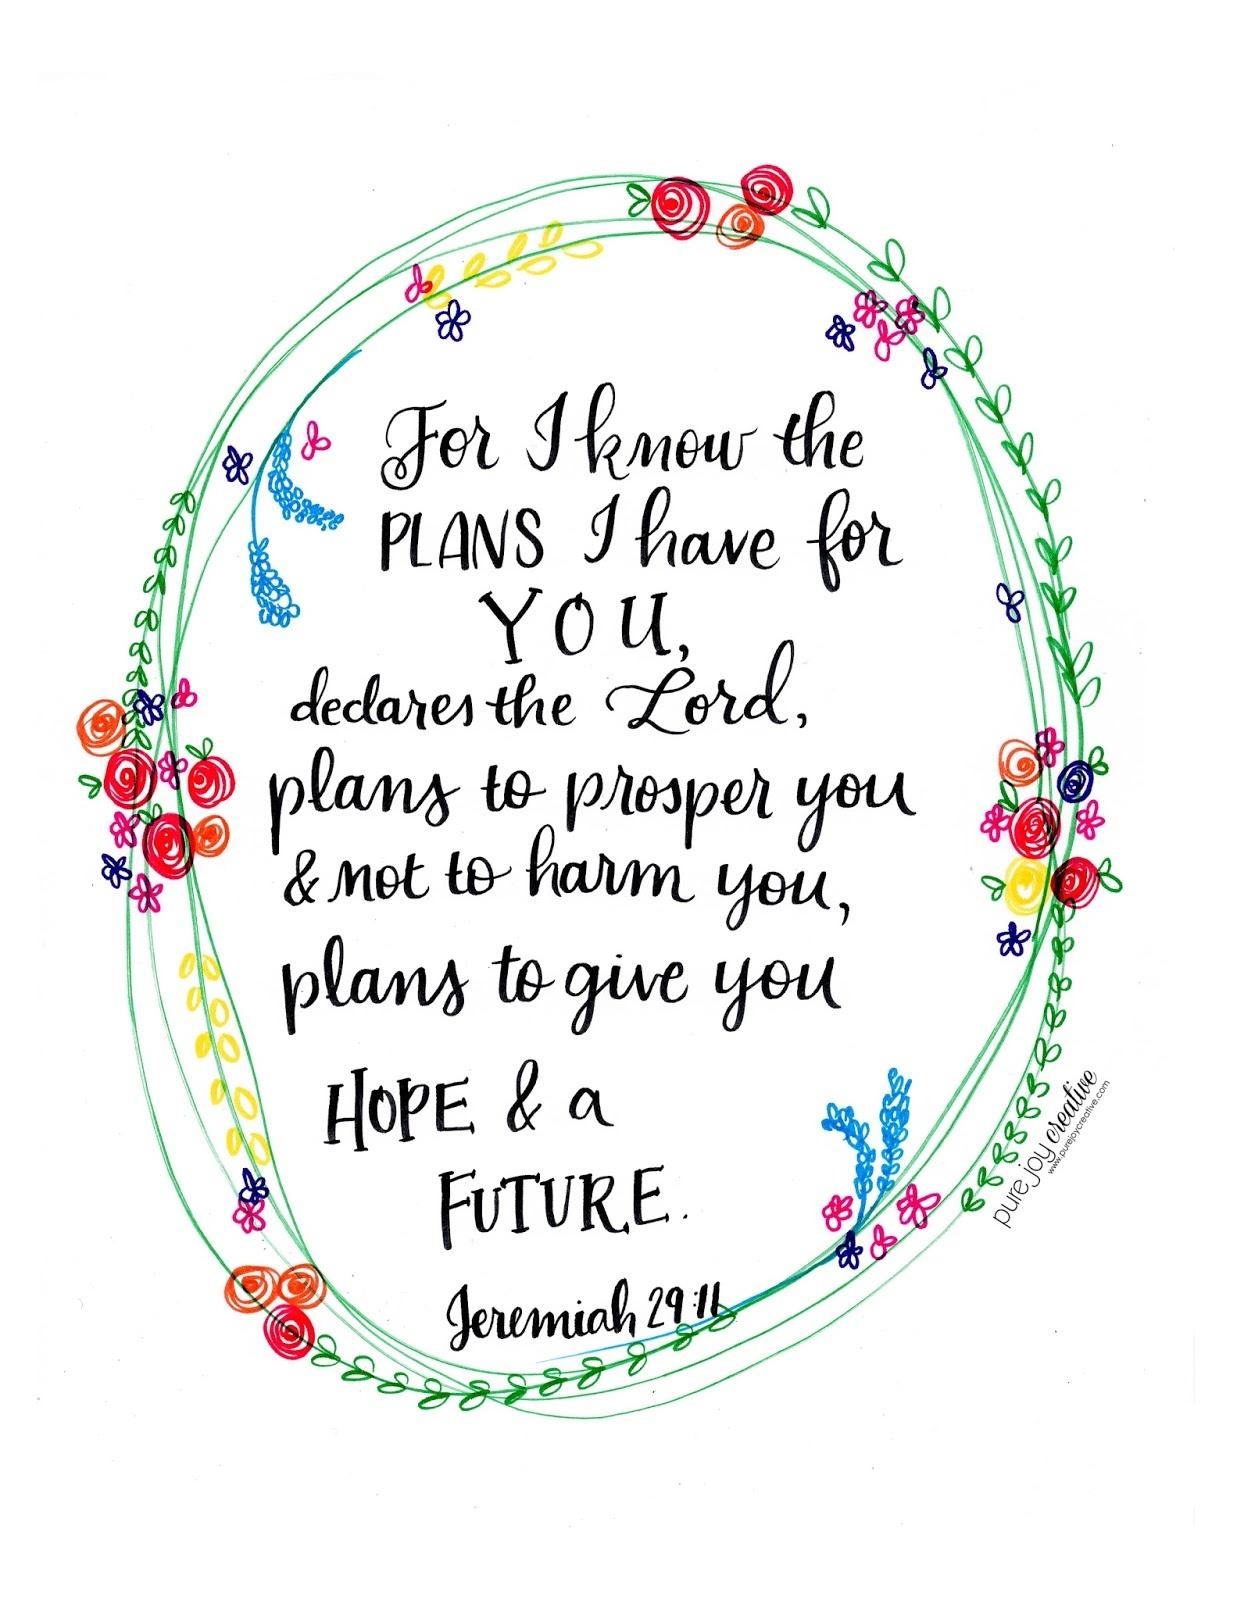 Pure Joy Creative: Jeremiah 29:11 Free Printable - Jeremiah 29 11 Free Printable